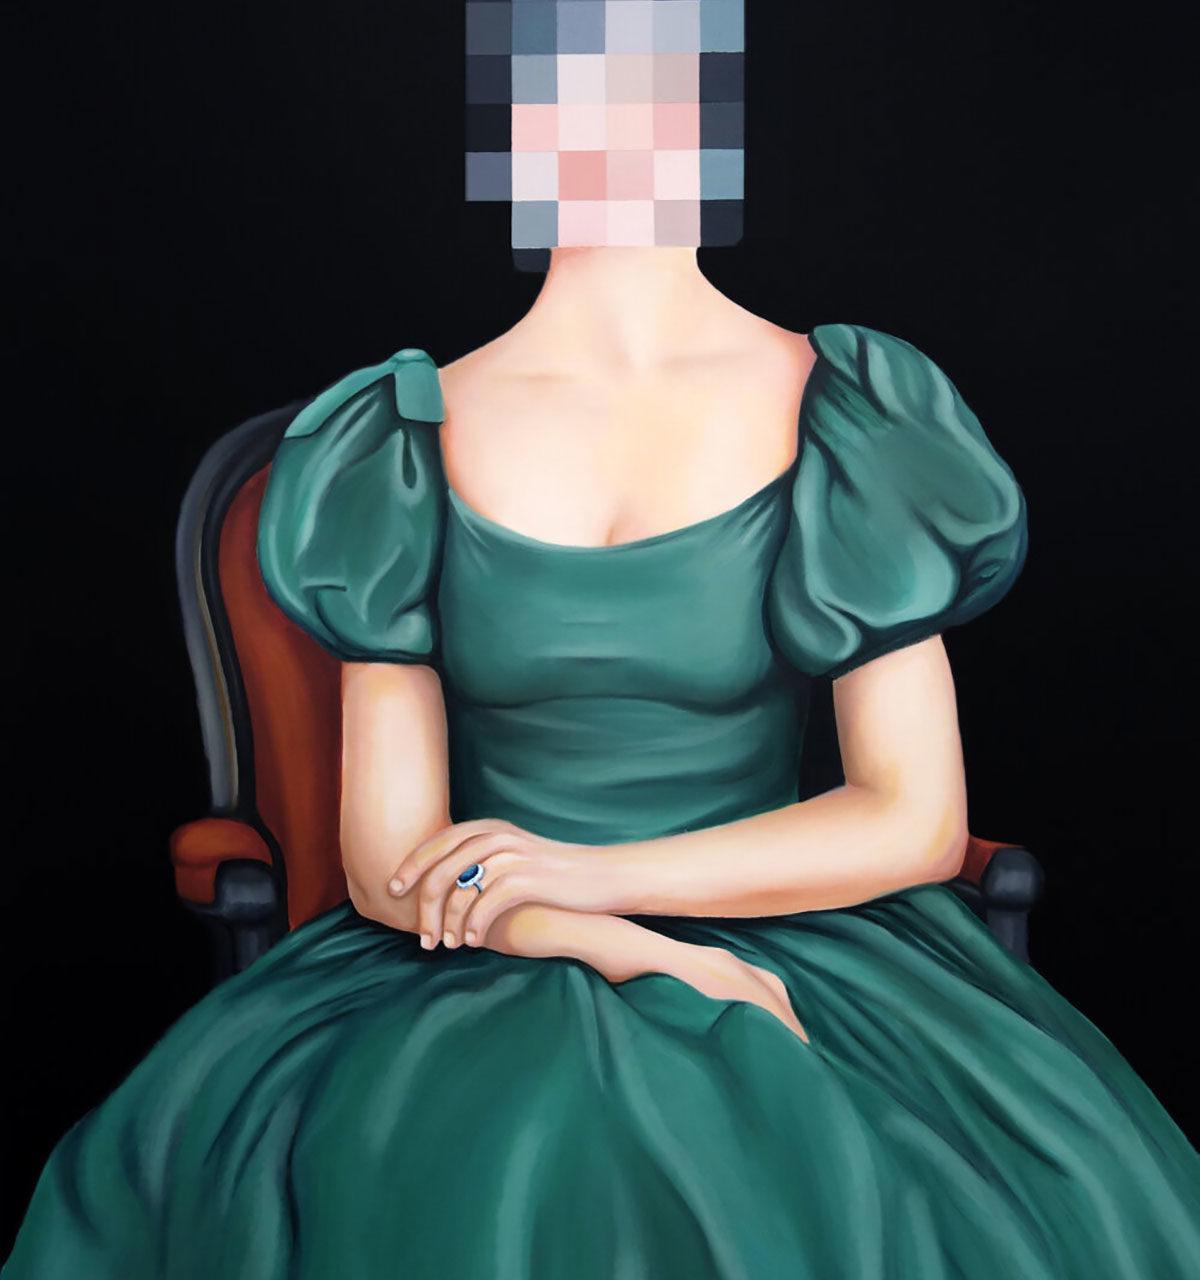 Reagan Corbett pixelated artwork of a woman in a green dress sitting on a chair